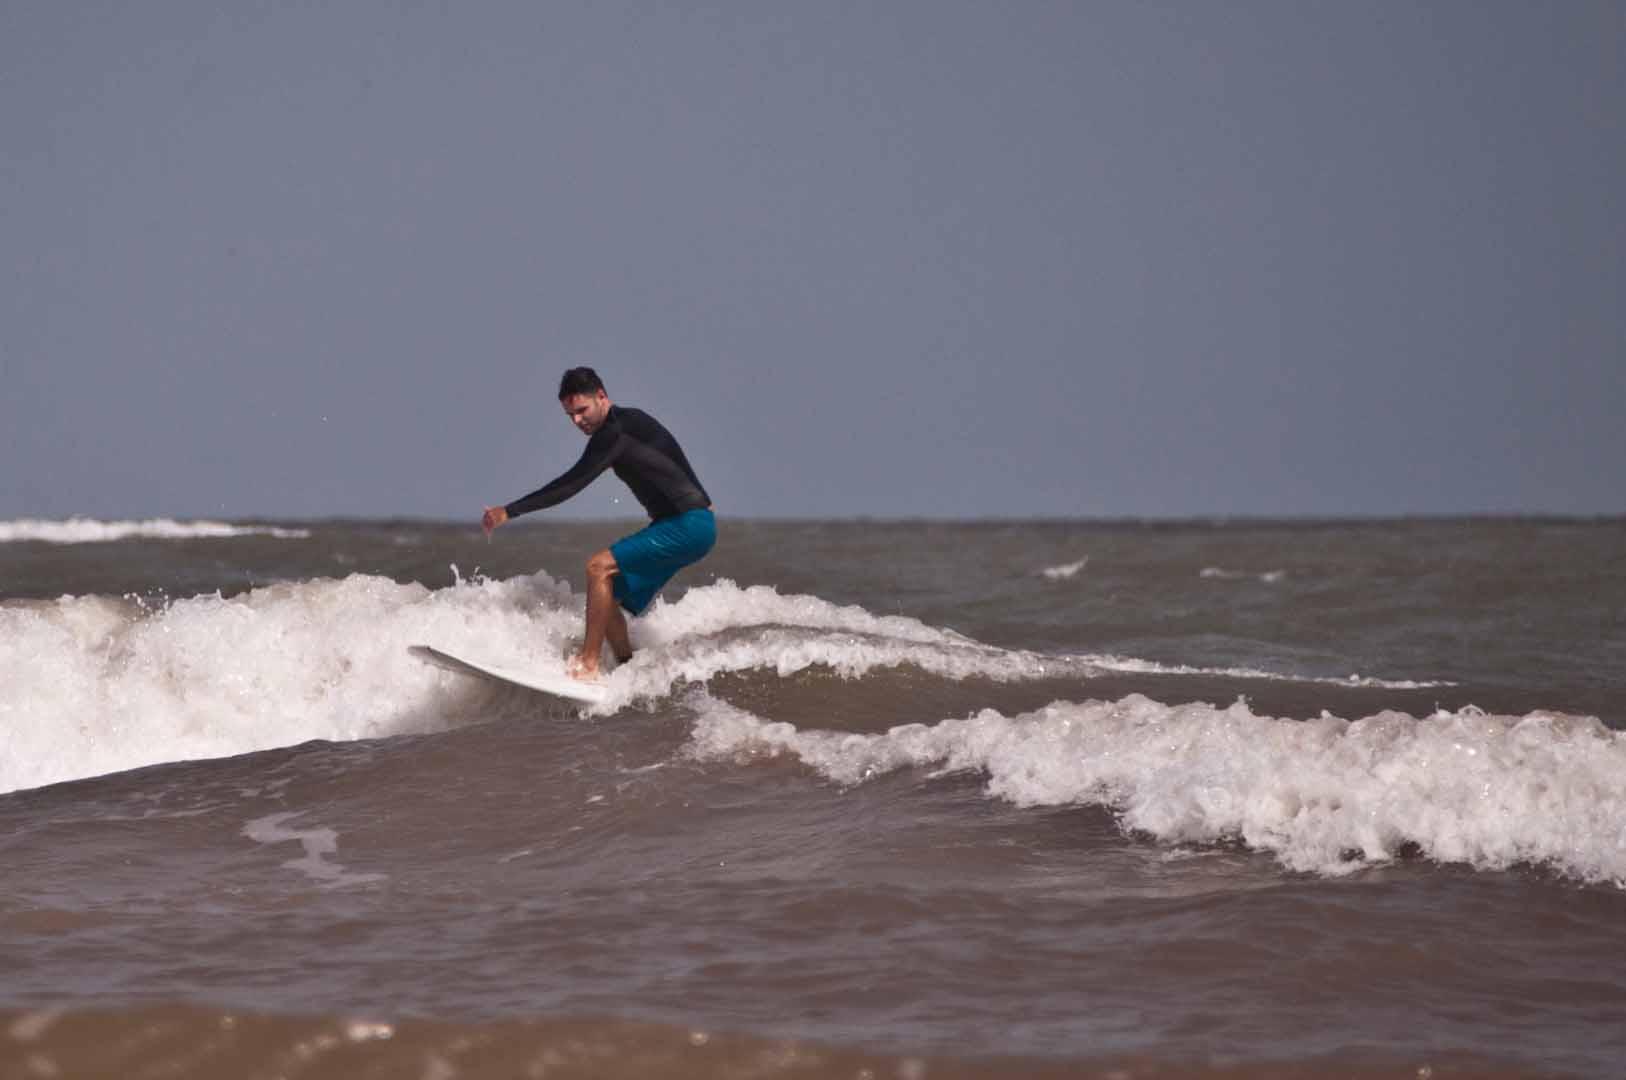 SurfsideJuly2_20150702_064